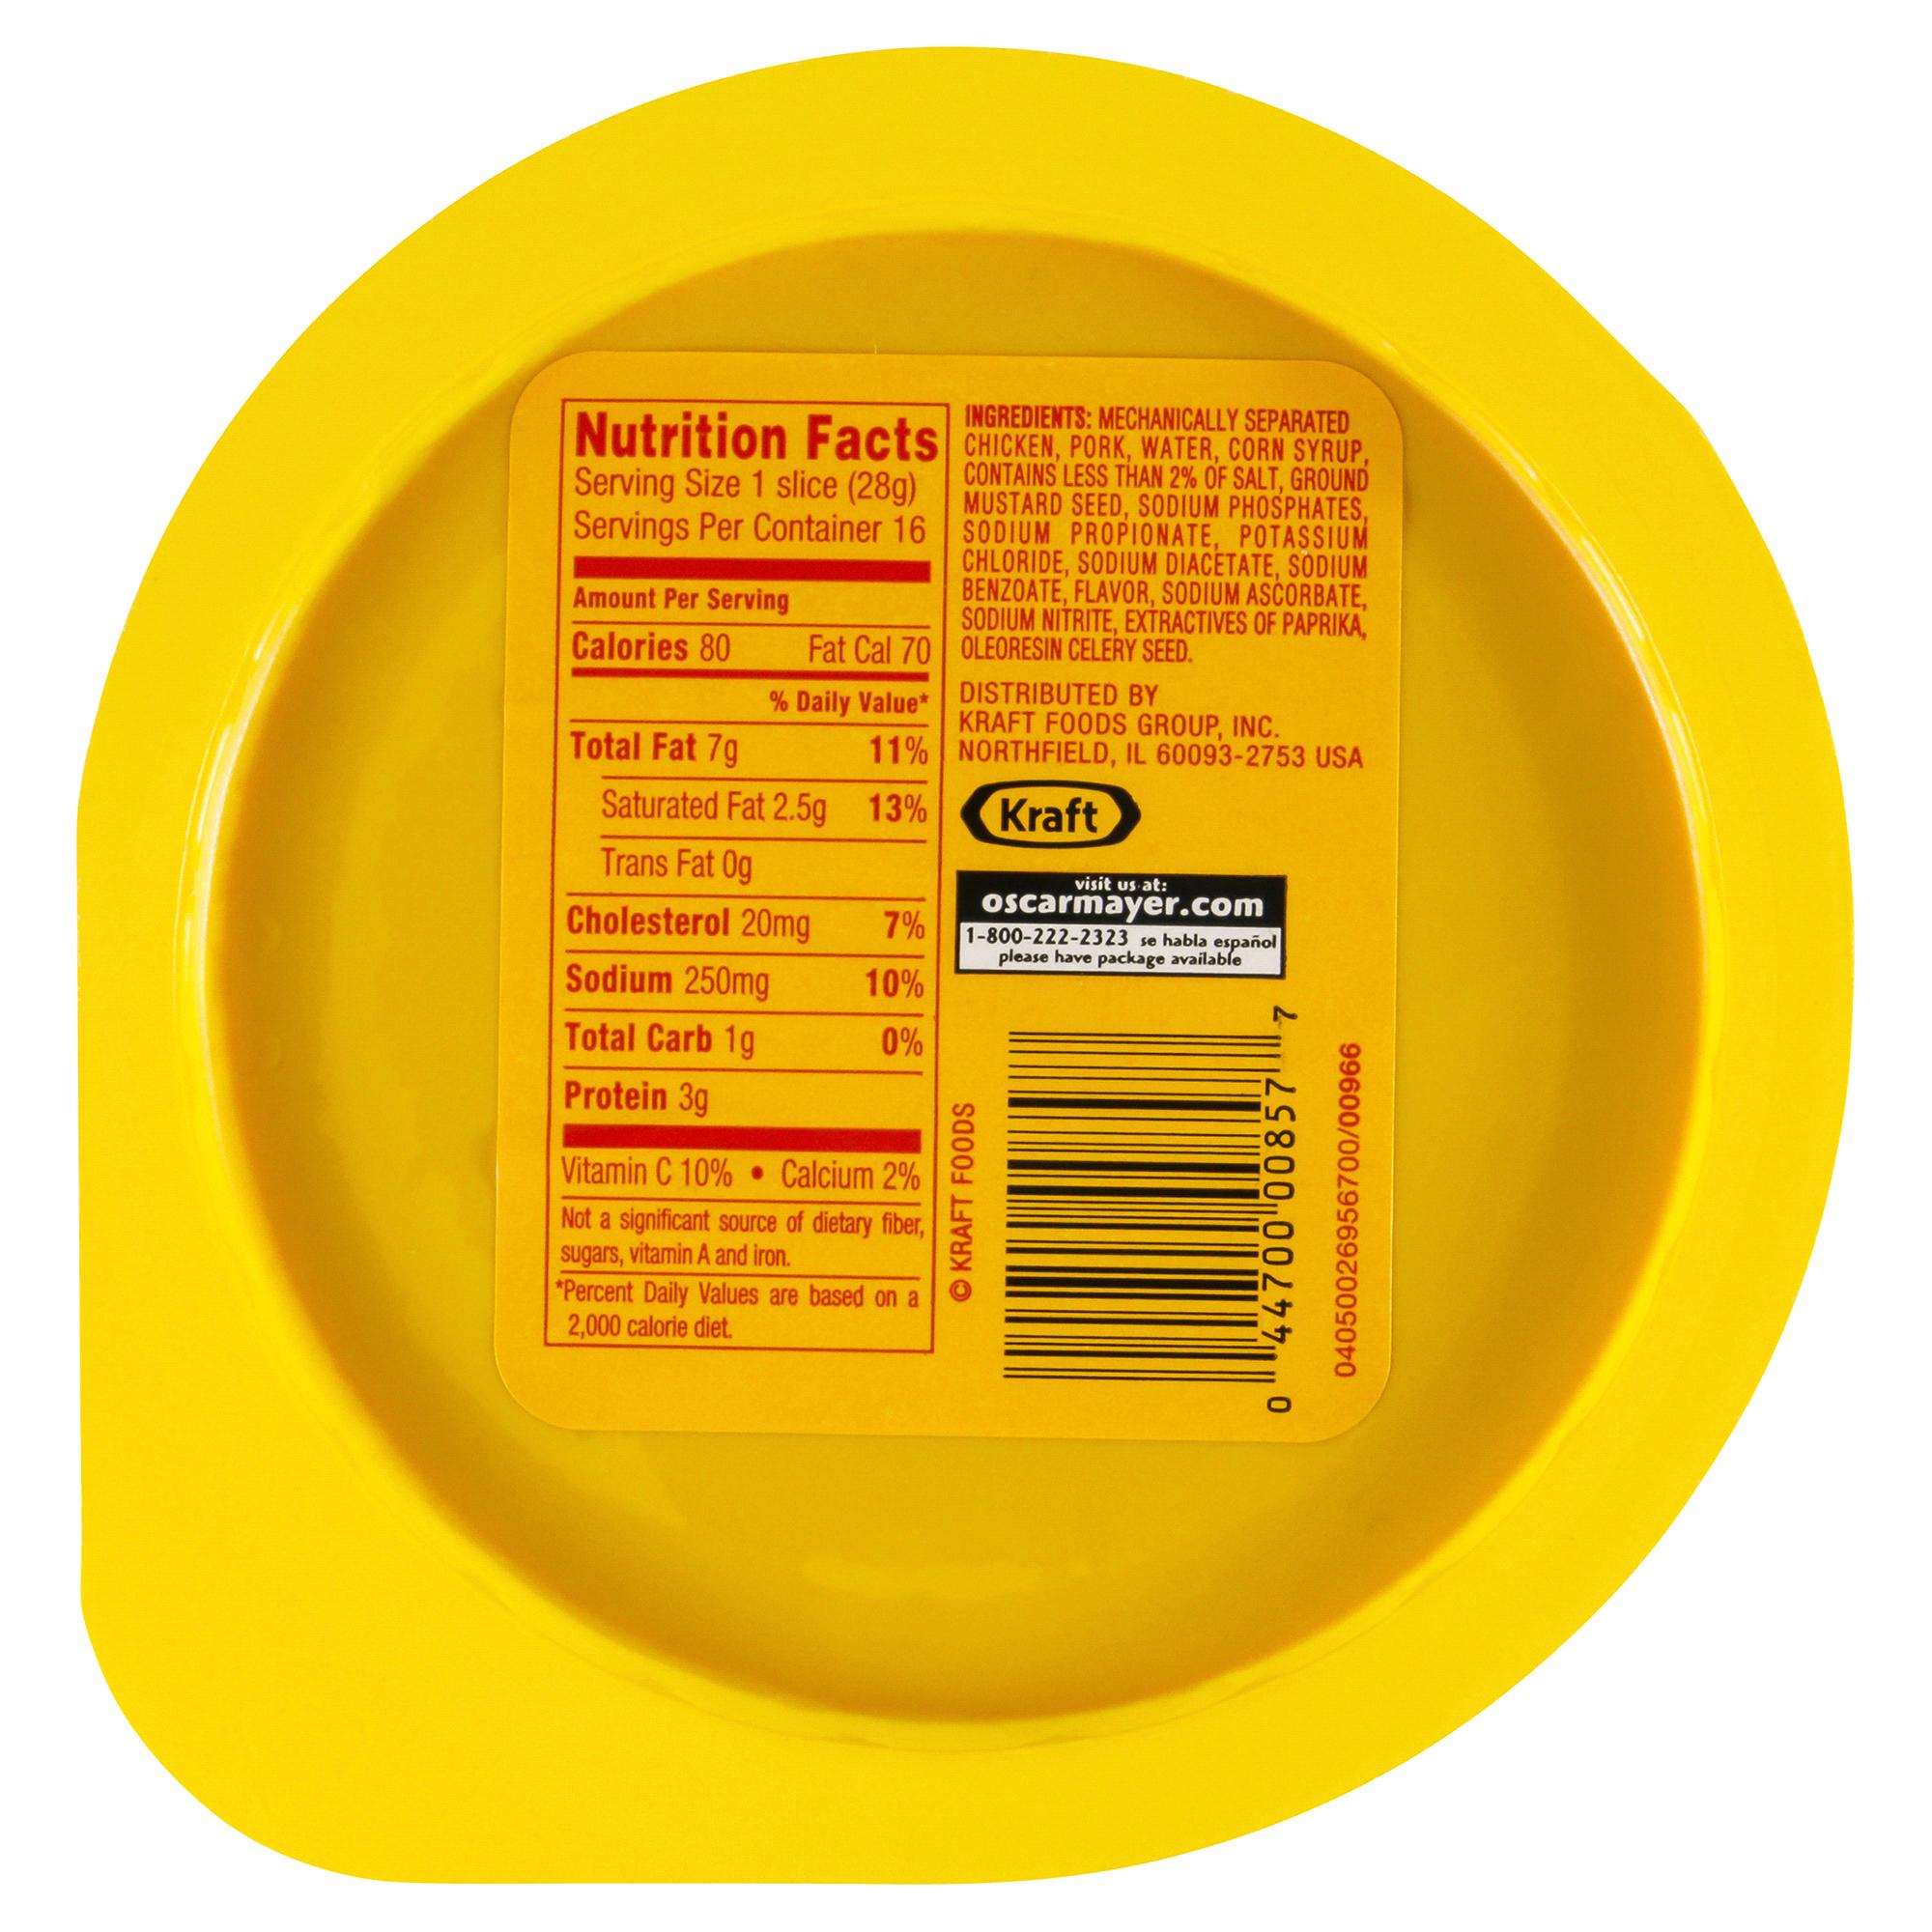 AC9CD40C E10E 11DF A102 FEFD45A4D471 besides Popular Chain Restaurants 31 as well 7187154654 additionally 24389658 as well Nutrition Facts Of Chicken Ham. on oscar mayer turkey bologna nutrition